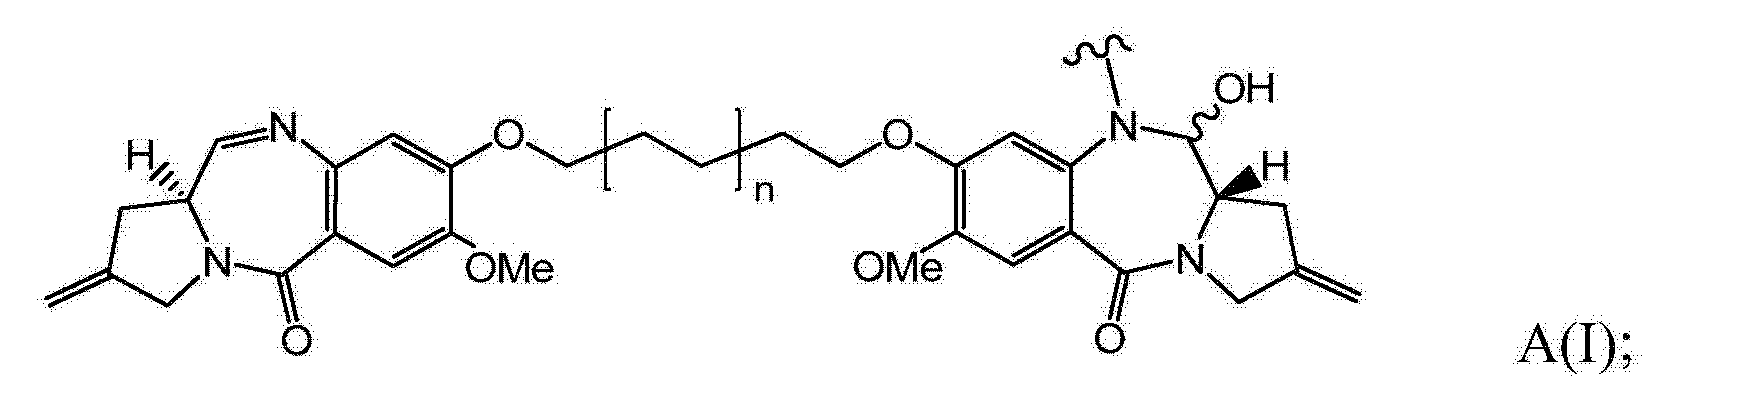 Figure CN104411721AD00722